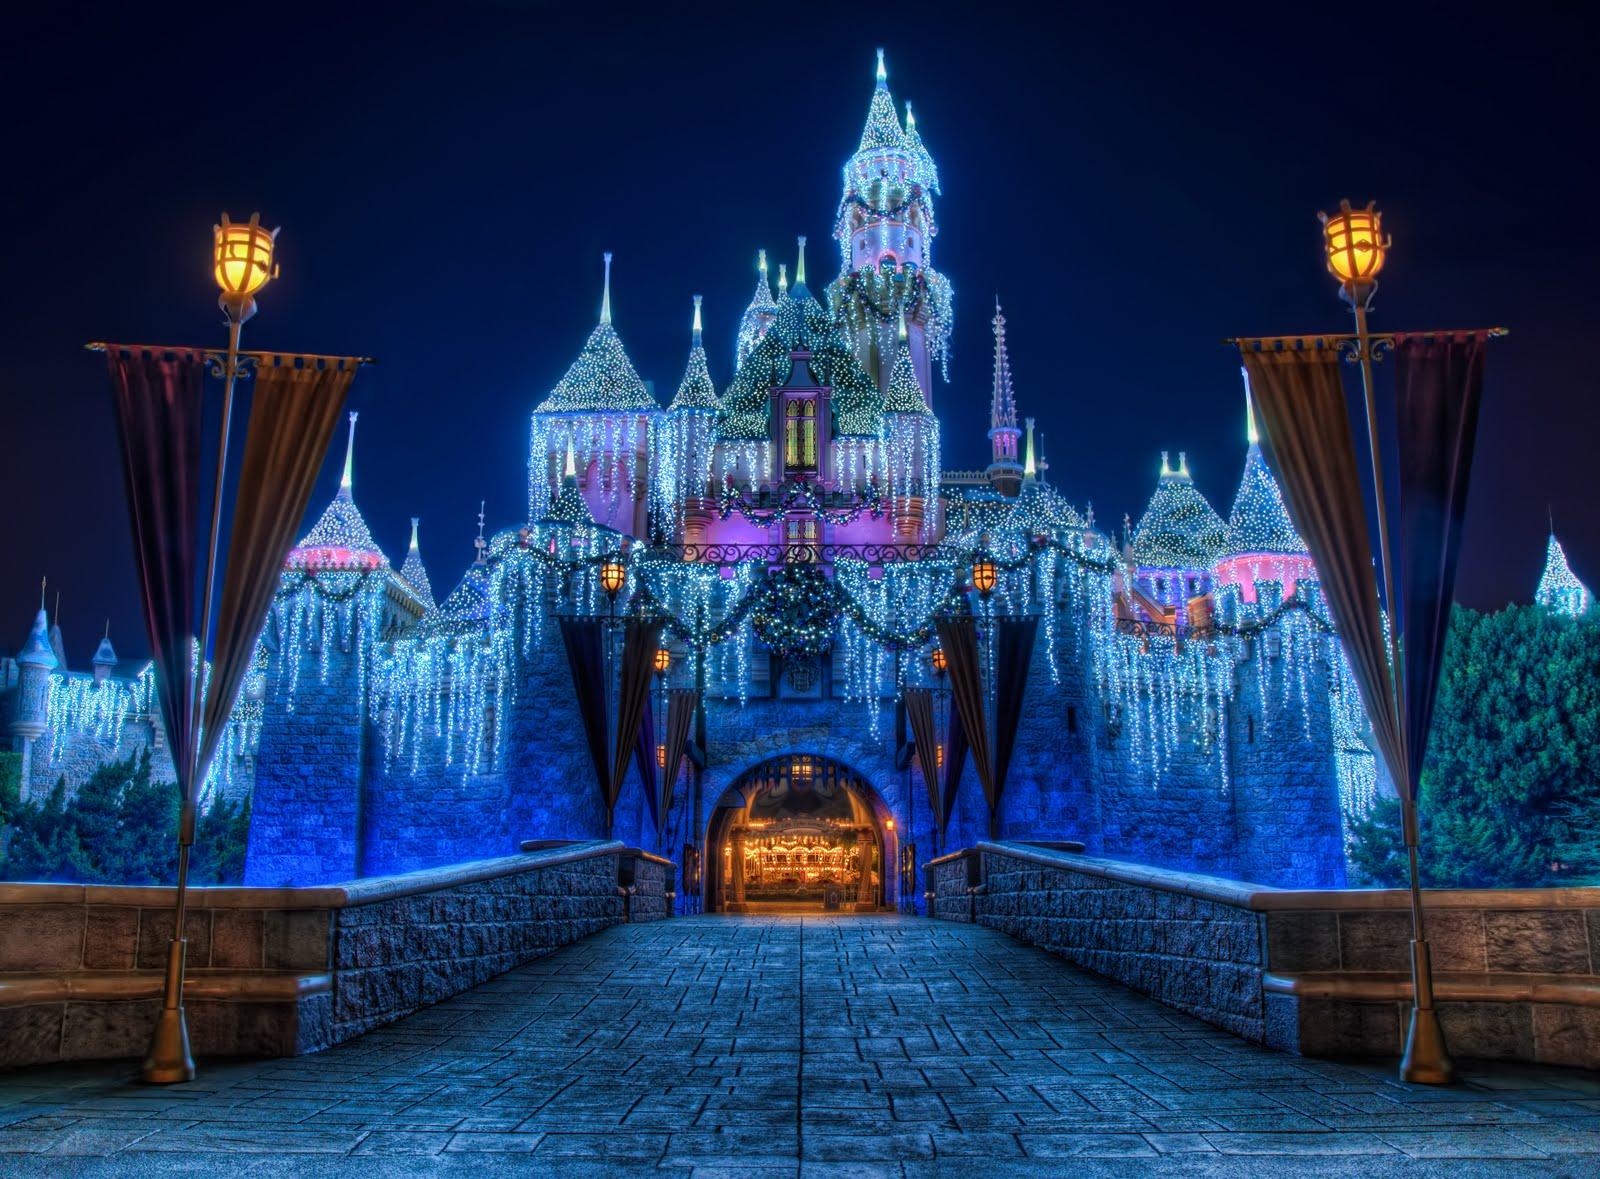 Disneyland Paris At Christmas 2019.Disneyland Paris Offers Dawson Travel